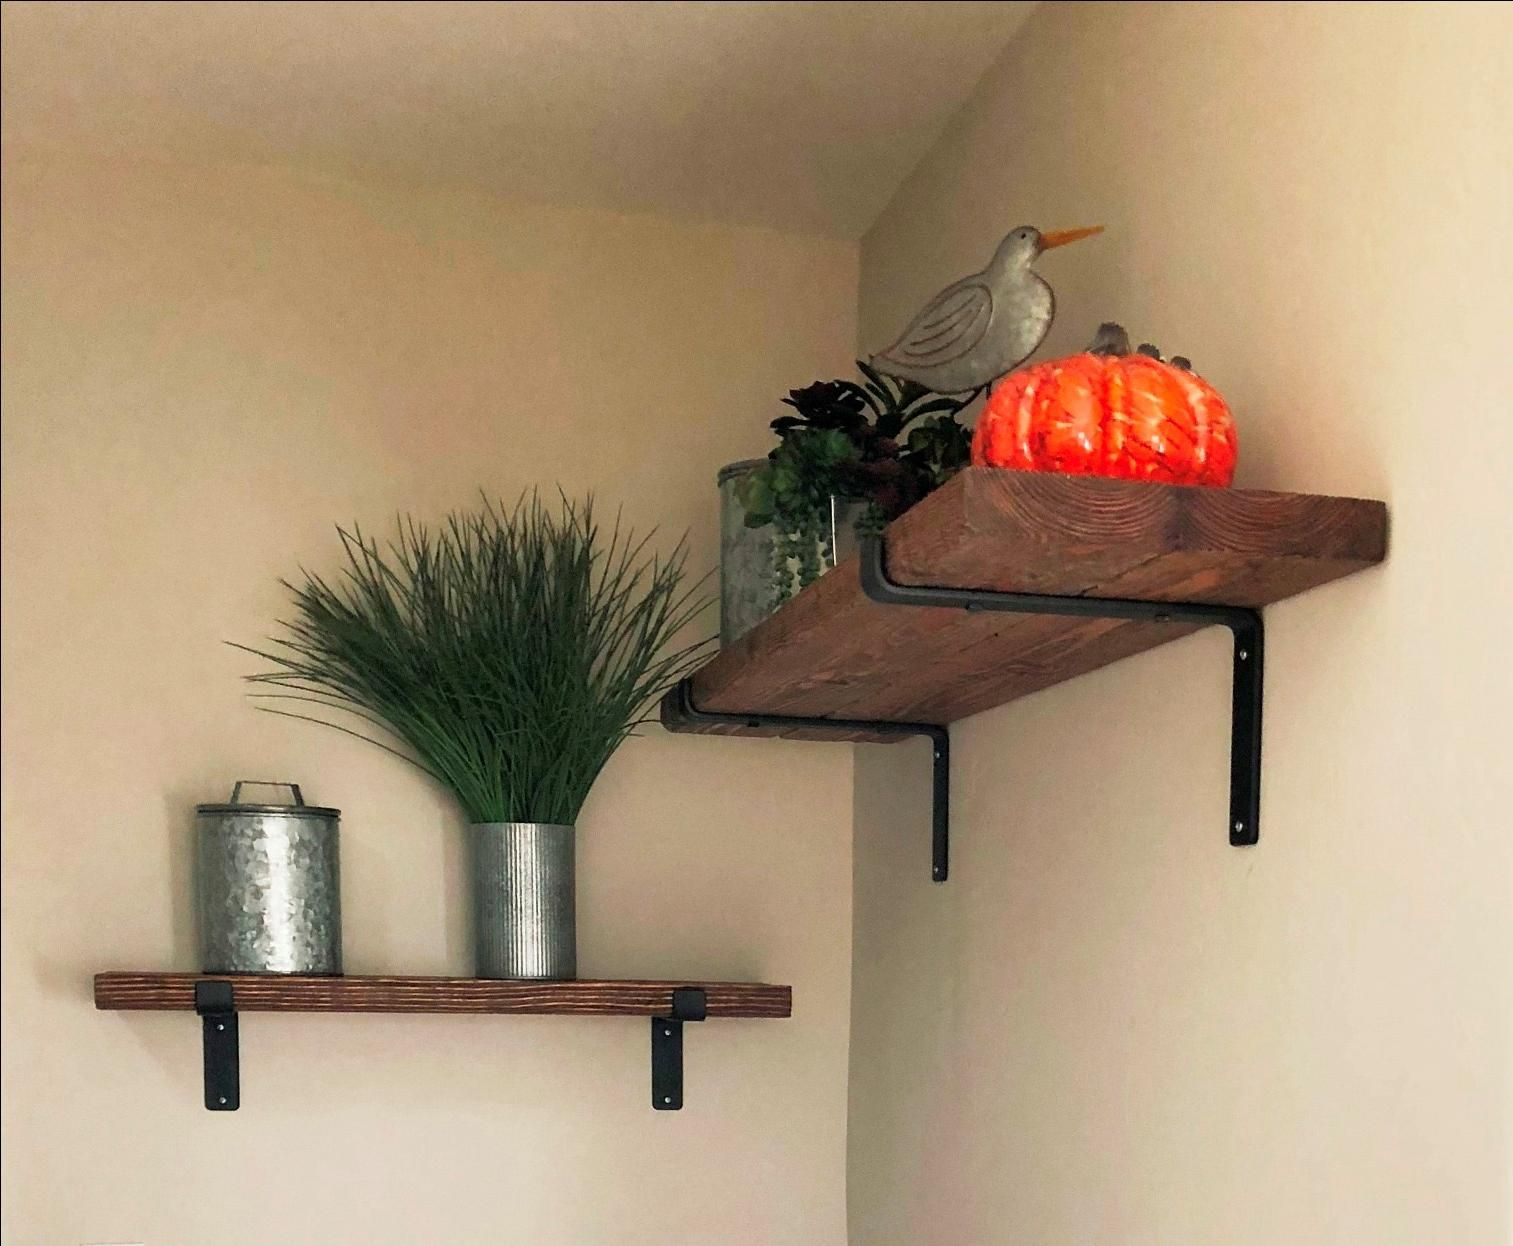 Buy Custom Made Rustic Farmhouse Shelf With Iron Brackets